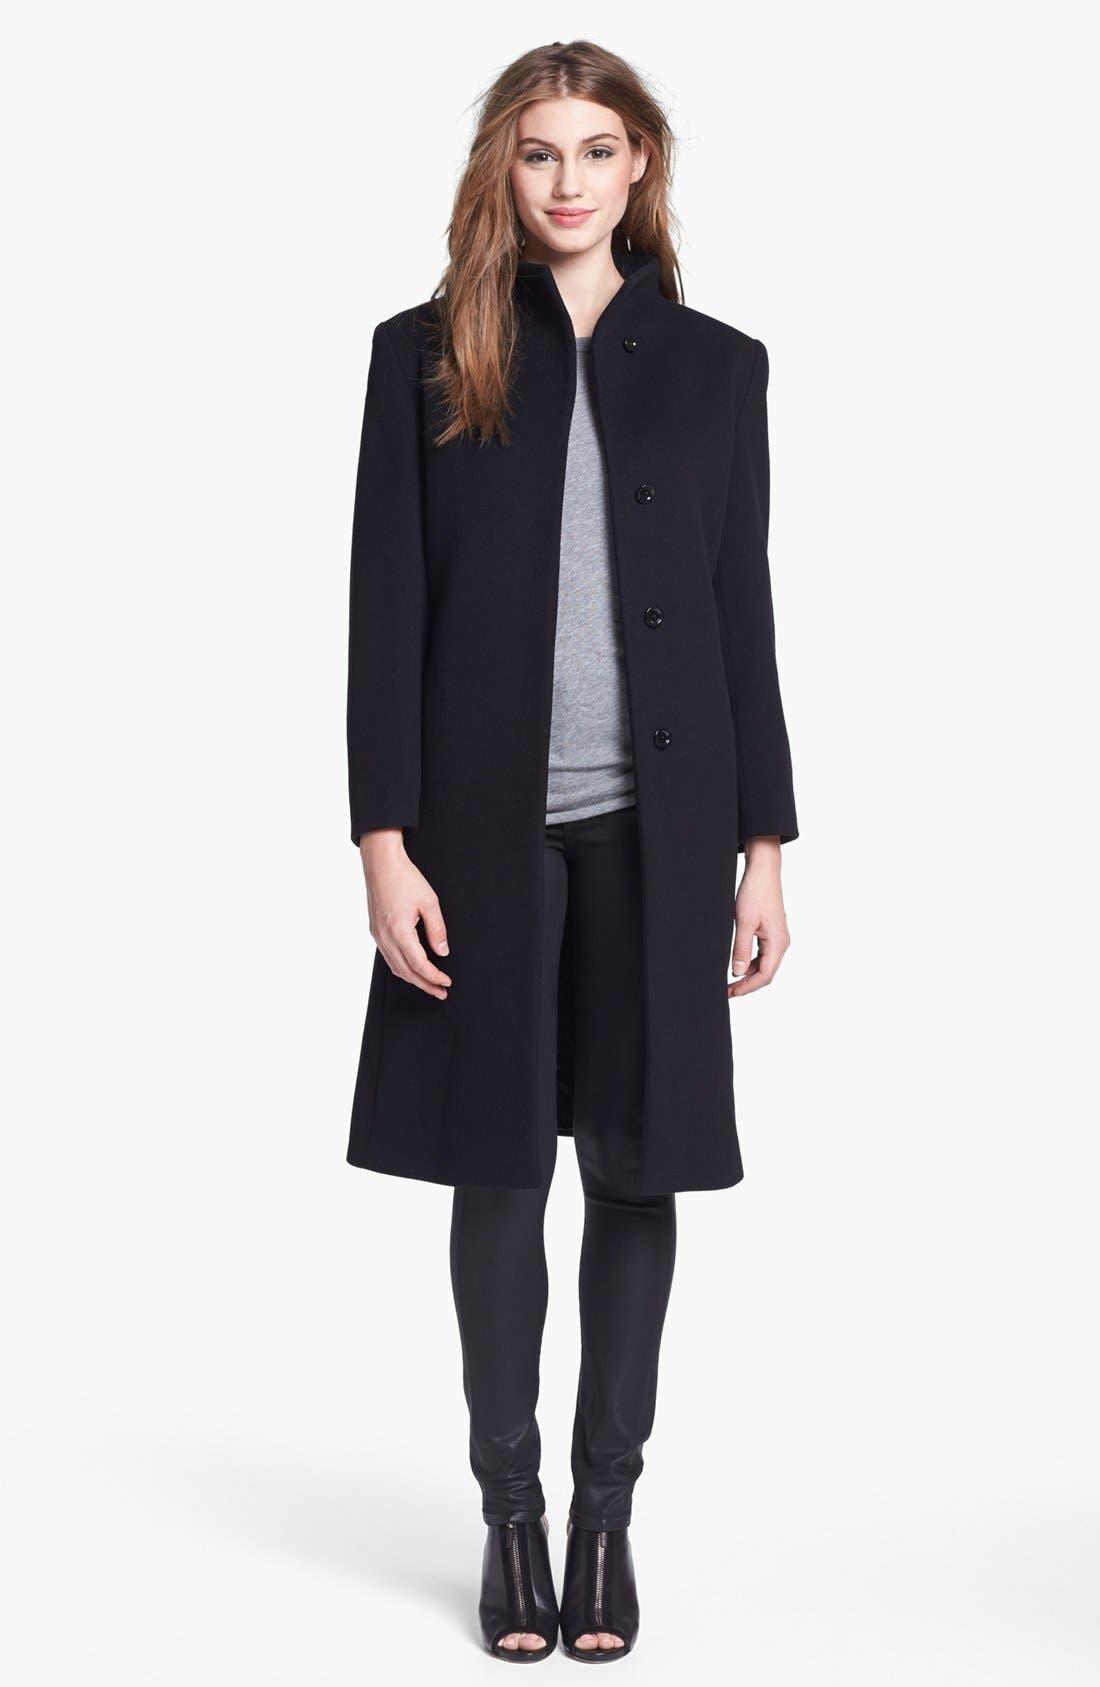 Alternate Image 1 Selected - Cinzia Rocca Due Funnel Neck Wool & Cashmere Blend Walking Coat (Petite)